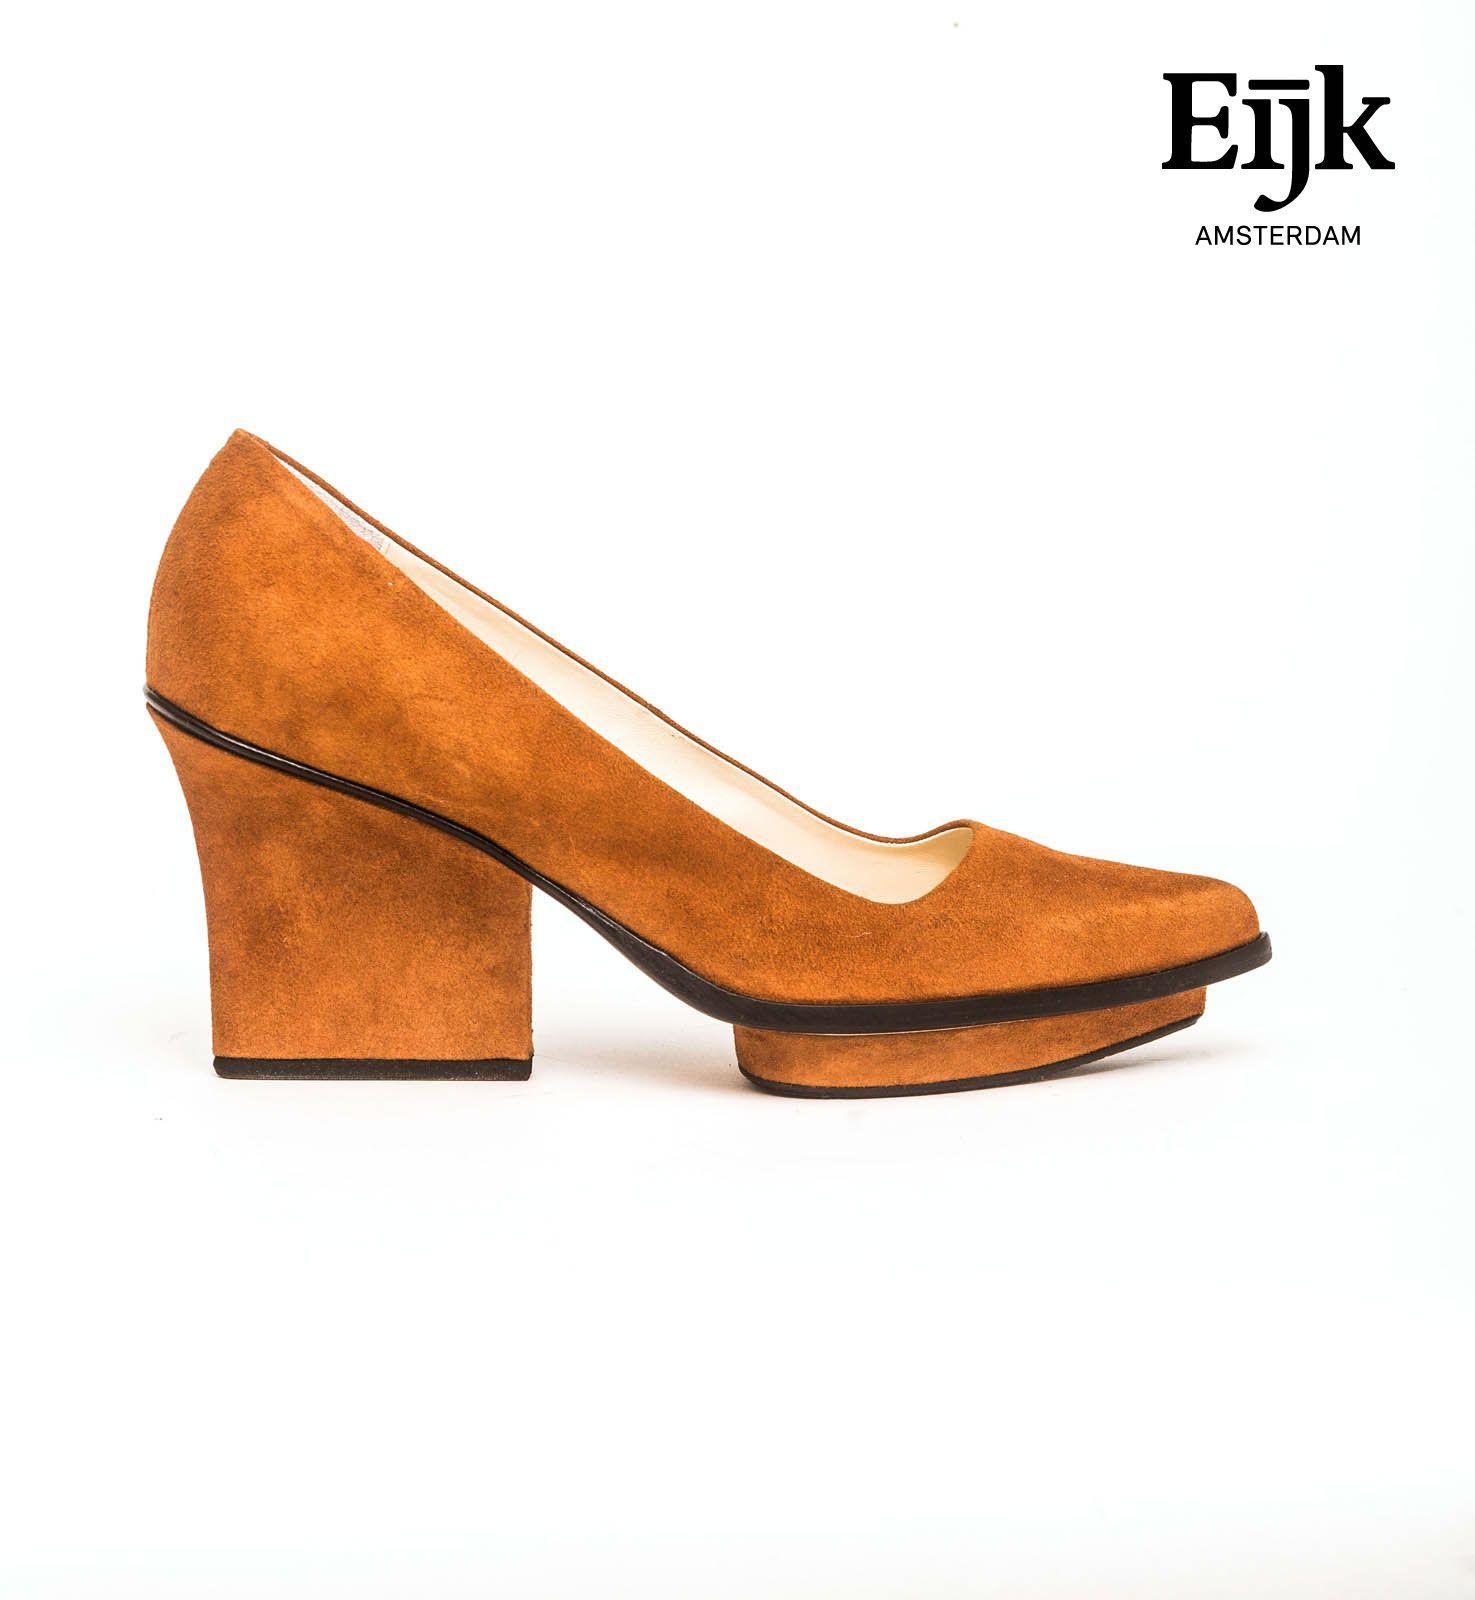 Eijk Amsterdam Коллекция Осень/Зима 2014